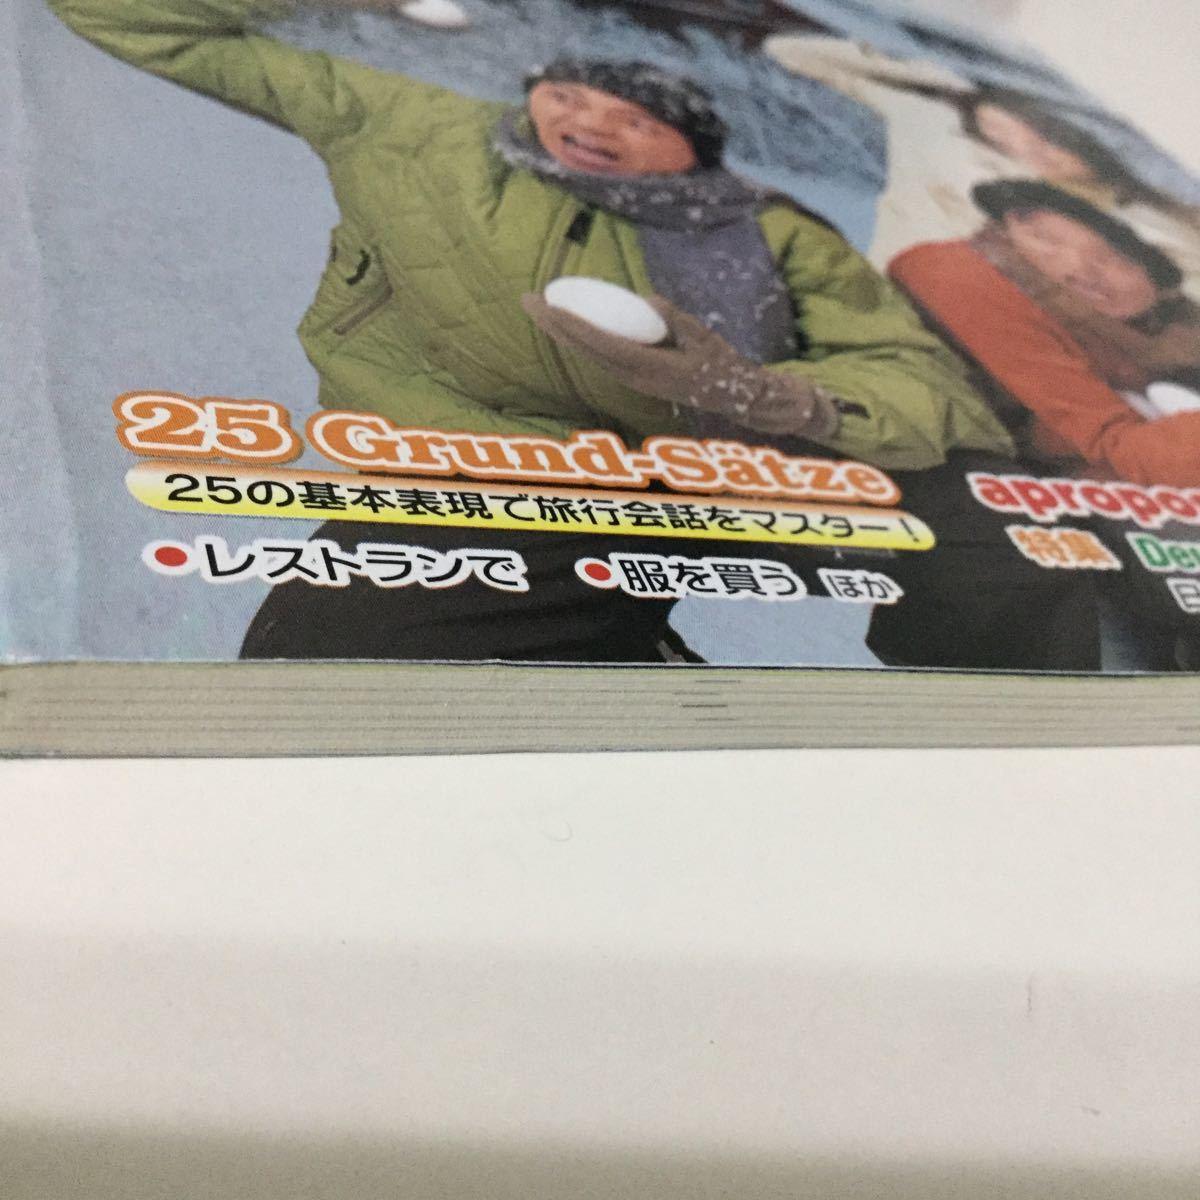 42 NHKテレビドイツ語会話1 2005年1月1日発行1月号 相澤啓一 日本放送出版協会 本 英語 ドイツ語 発音 ナターシャのドイツ語 英会話 辞書_画像2